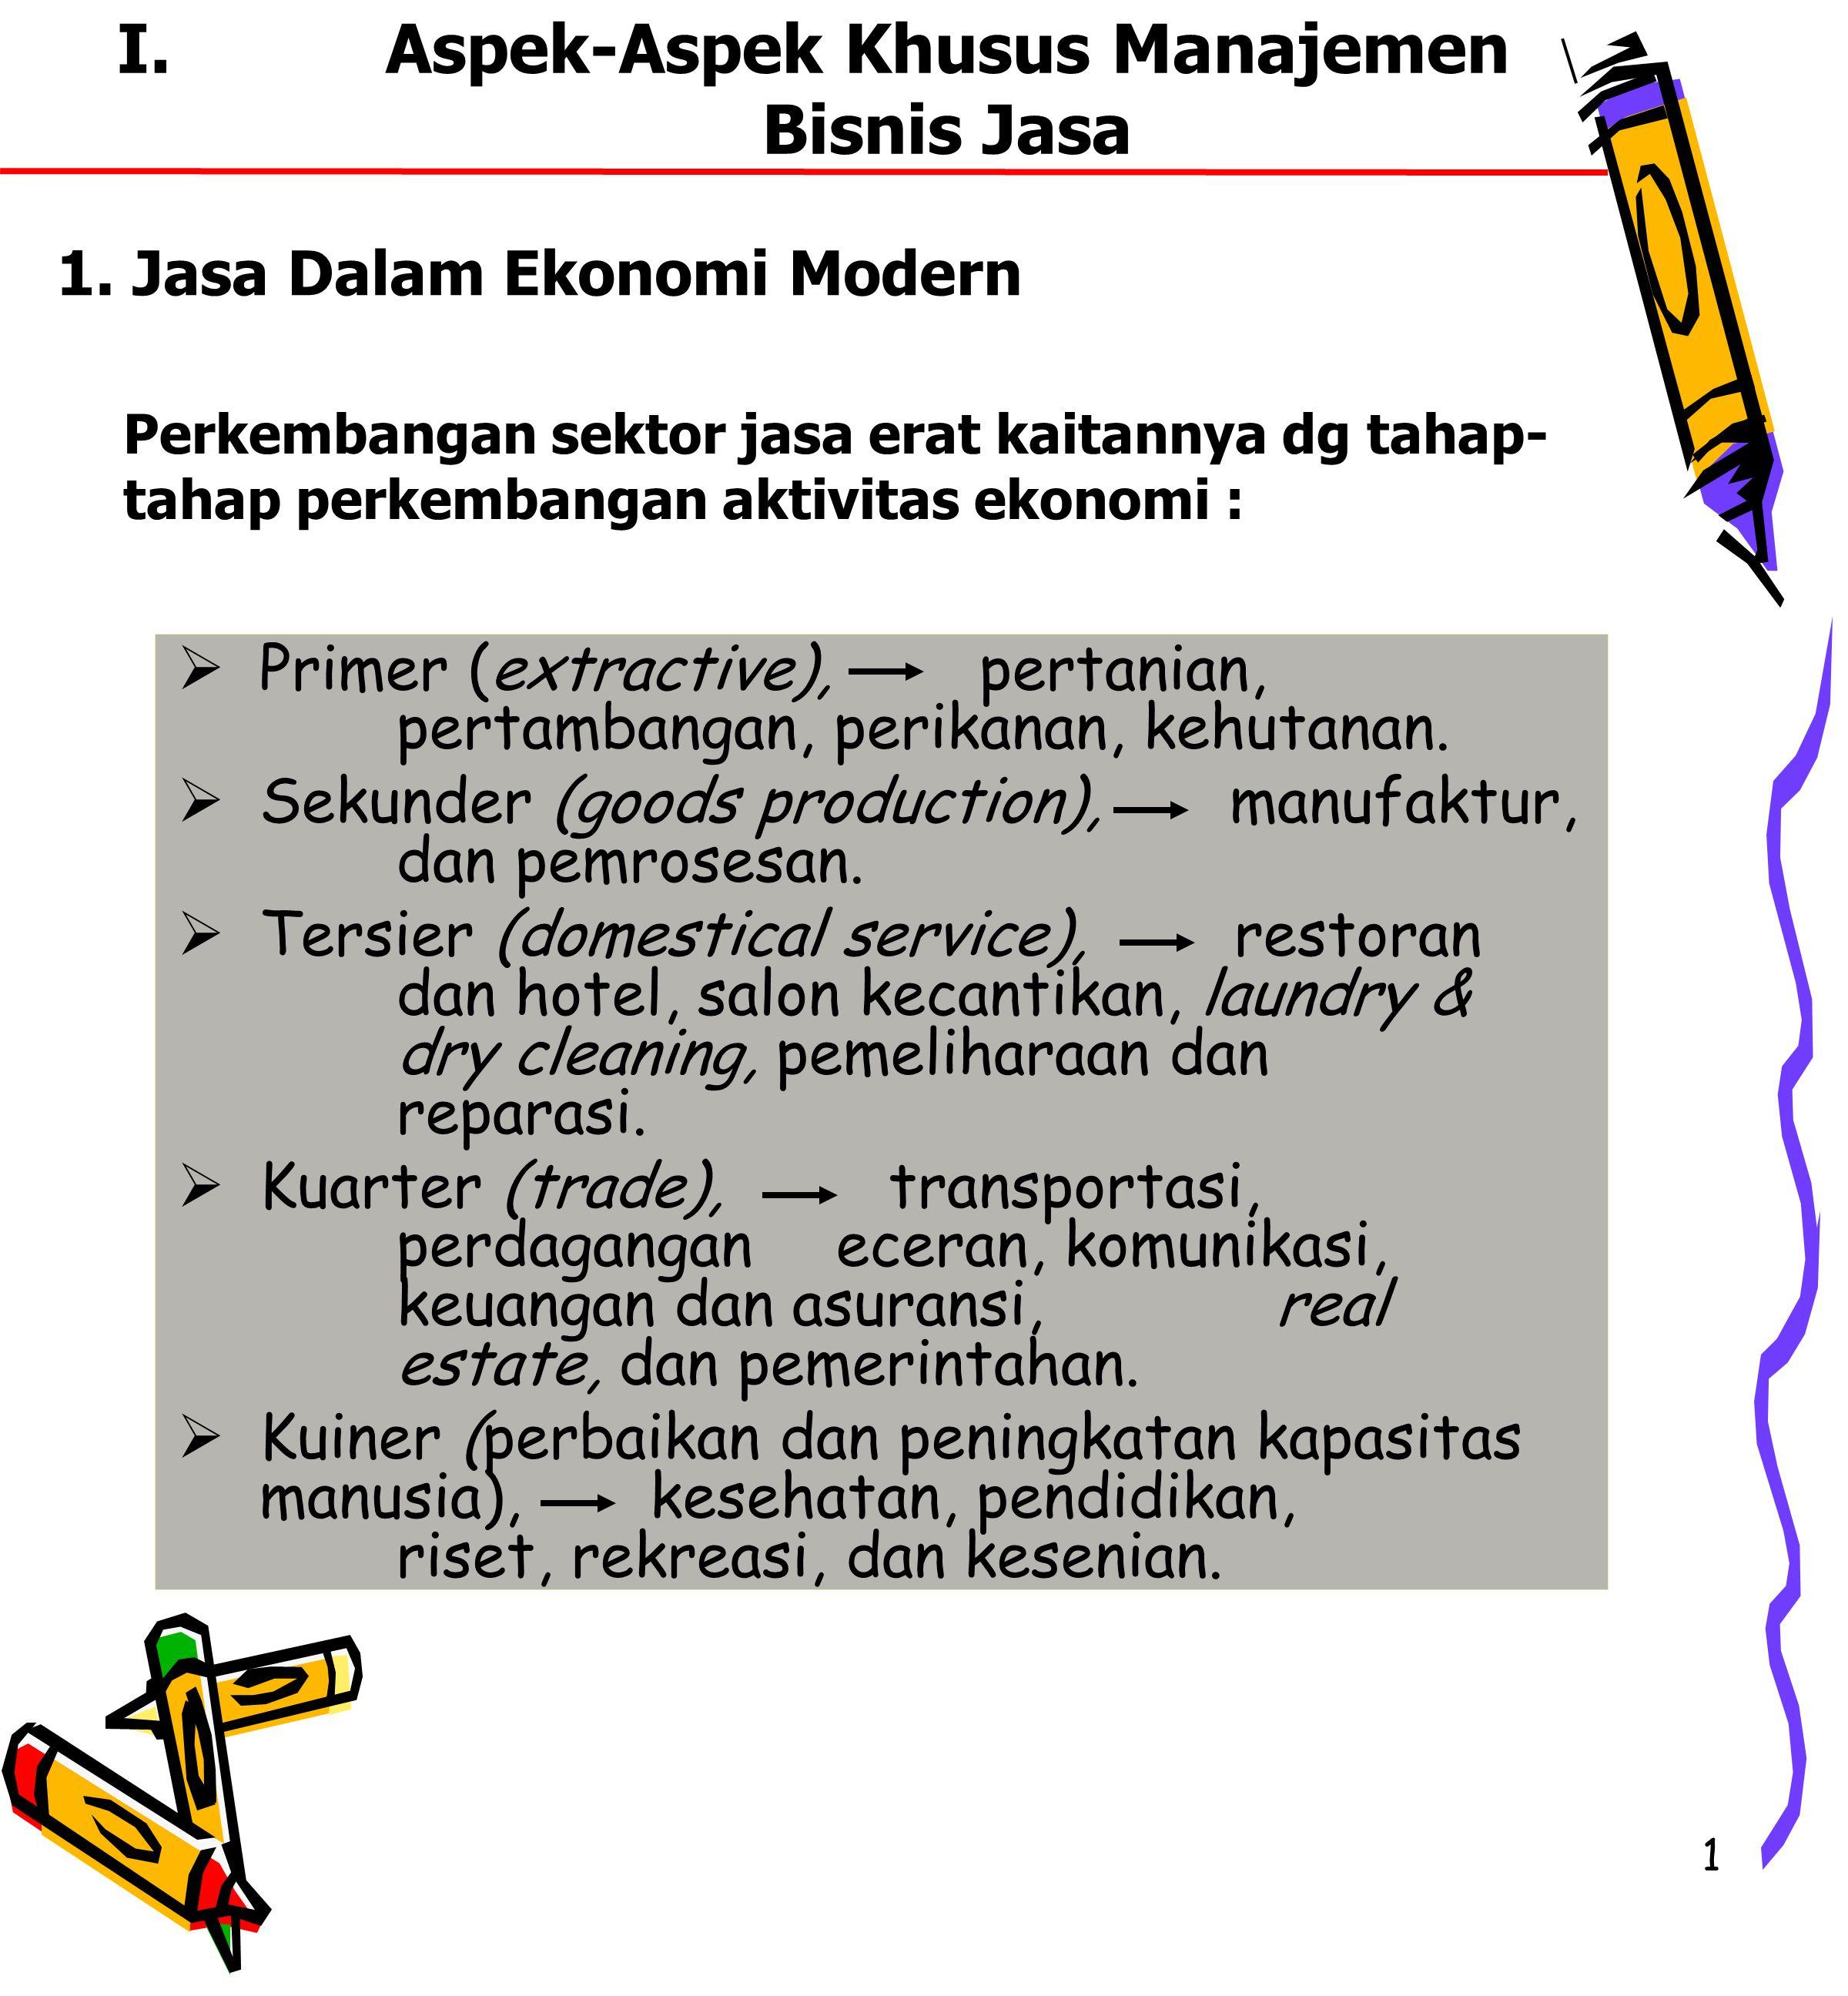 1 I.Aspek-Aspek Khusus Manajemen Bisnis Jasa  Primer (extractive), pertanian, pertambangan, perikanan, kehutanan.